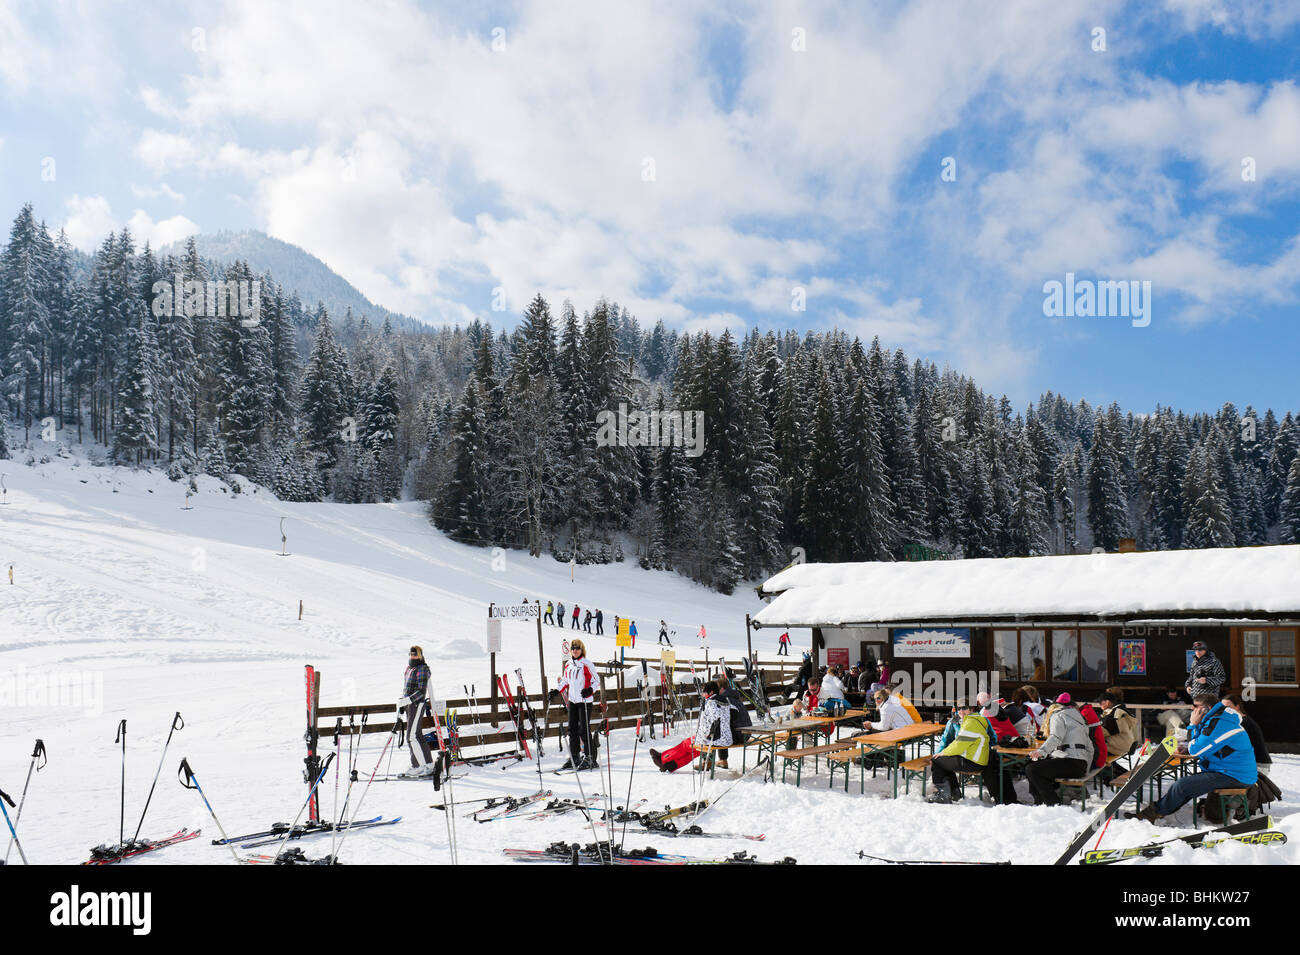 Drag lift and bar at the bottom of the slopes, Kirchberg, near Kitzbuhel, Tyrol, Austria - Stock Image